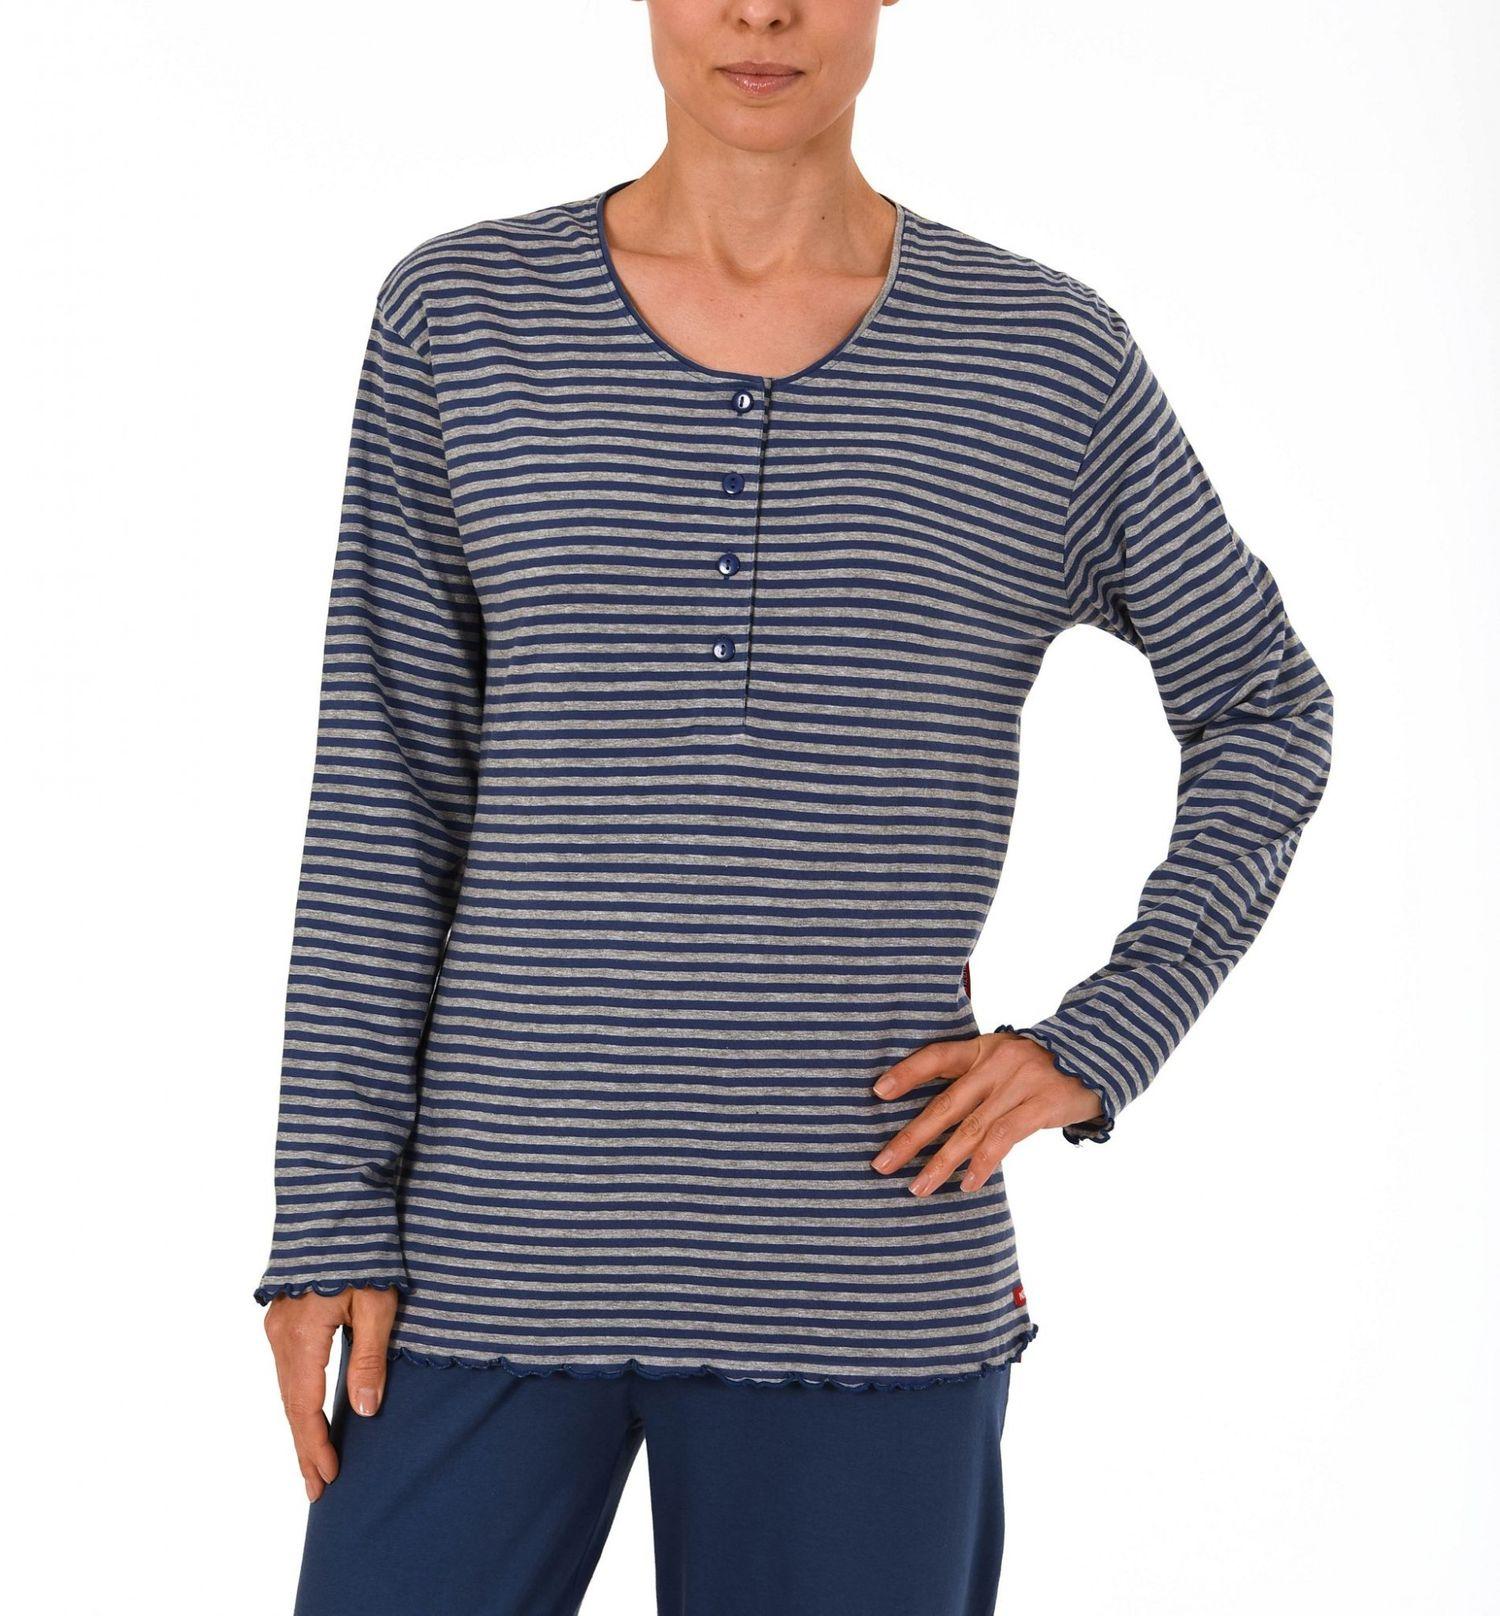 Damen Shirt  Oberteil - langarm Mix & Match Streifendesign – 261 219 90 105 – Bild 1